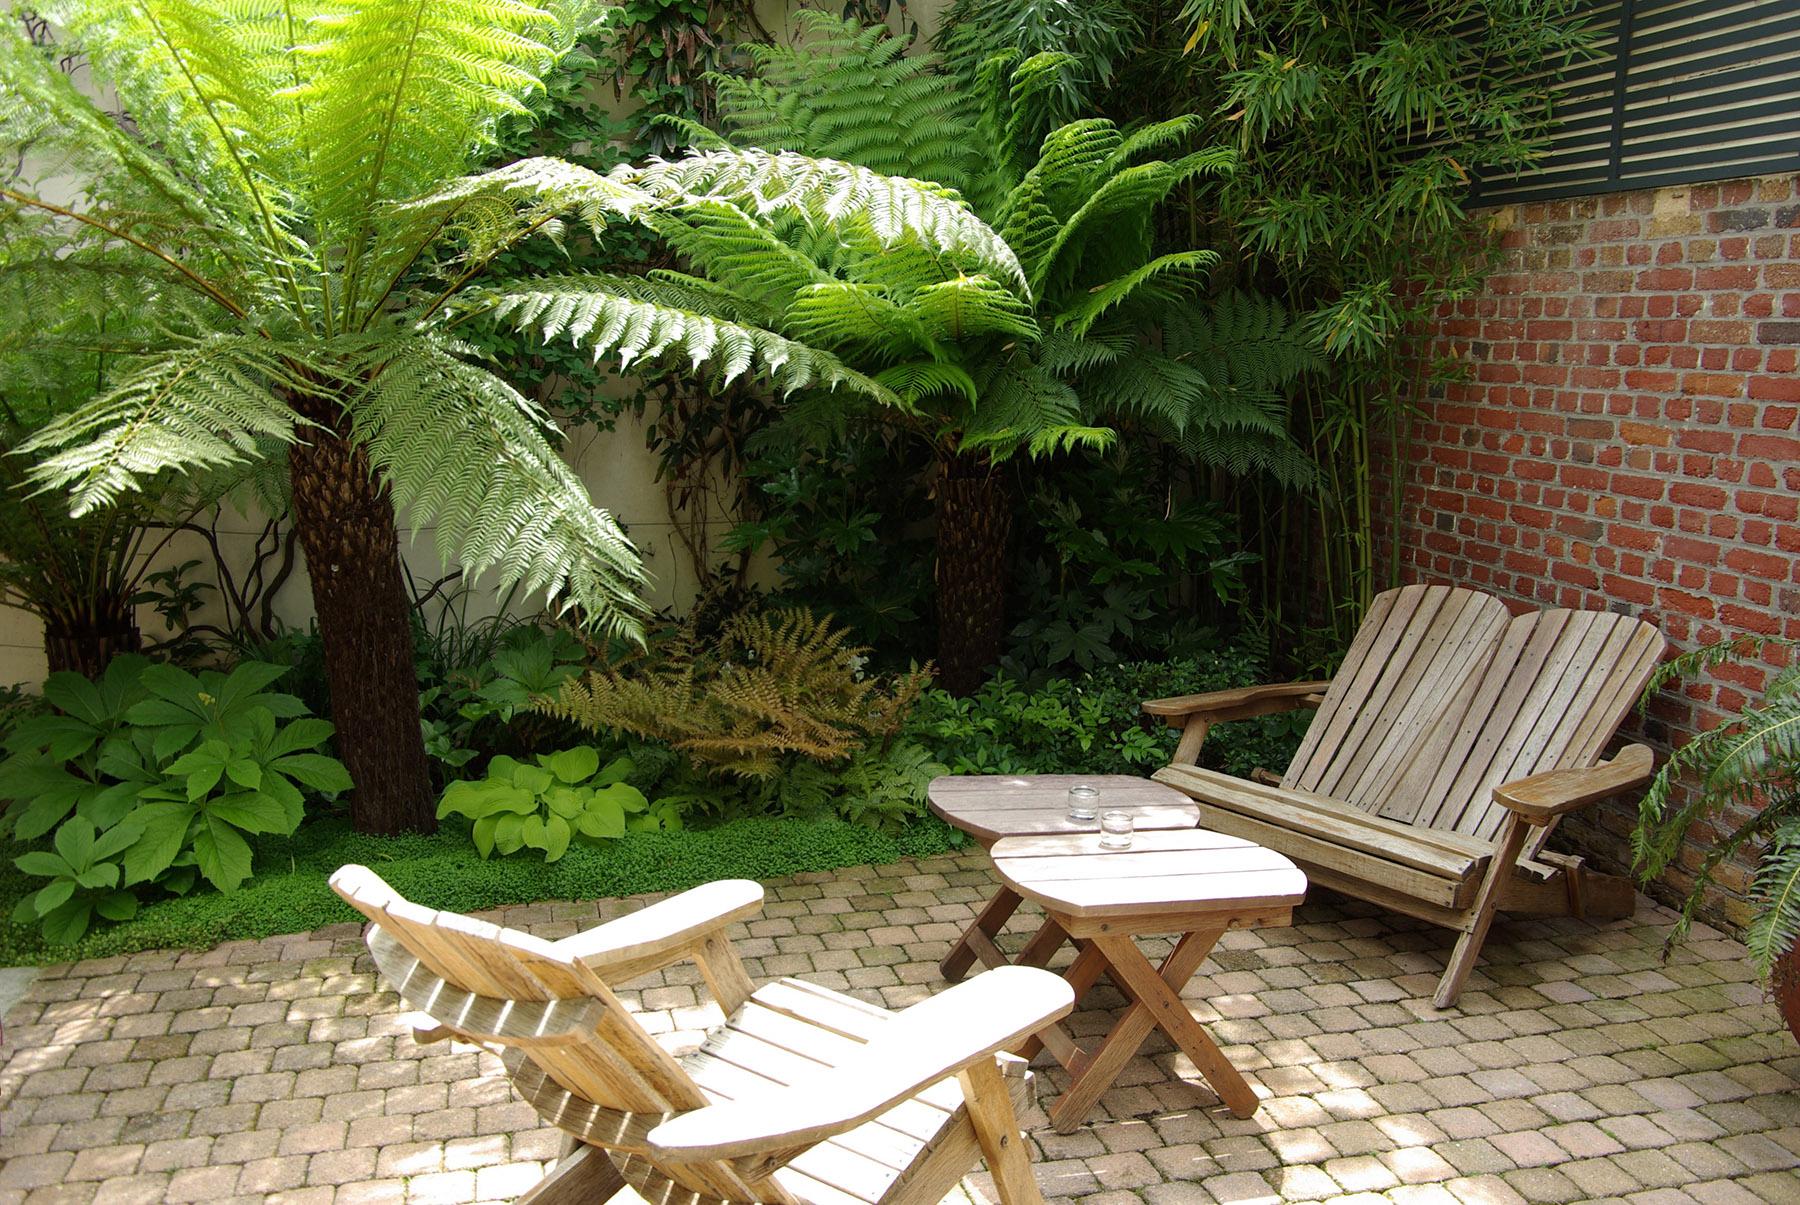 Jardin exotique design paysagiste Paris Olivia Bochet